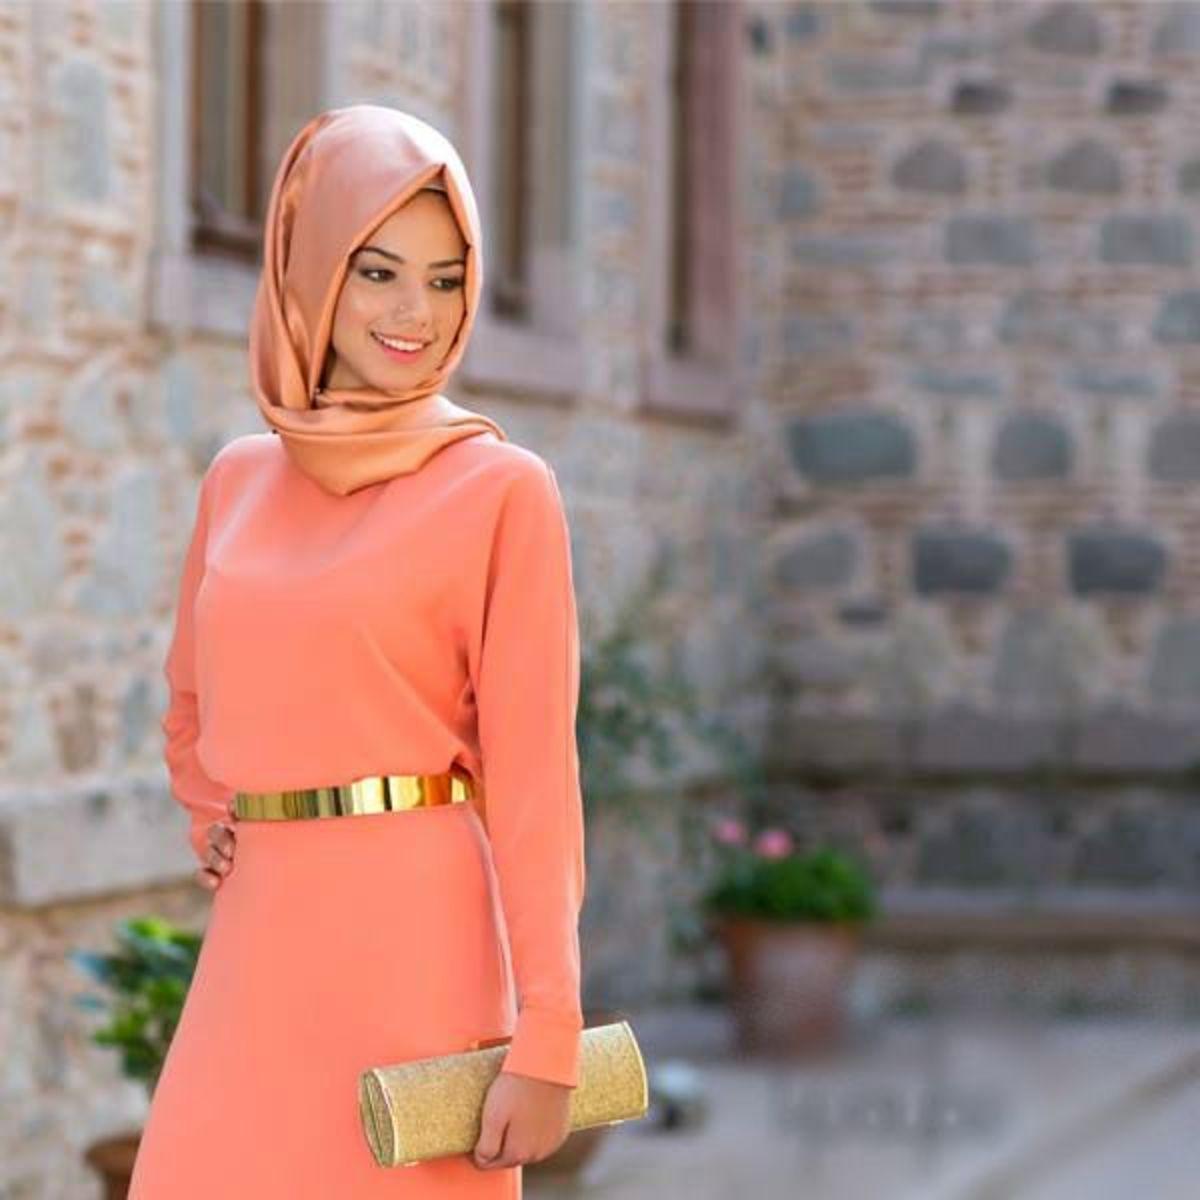 Woman in Hijab wearing Peach maxi dress